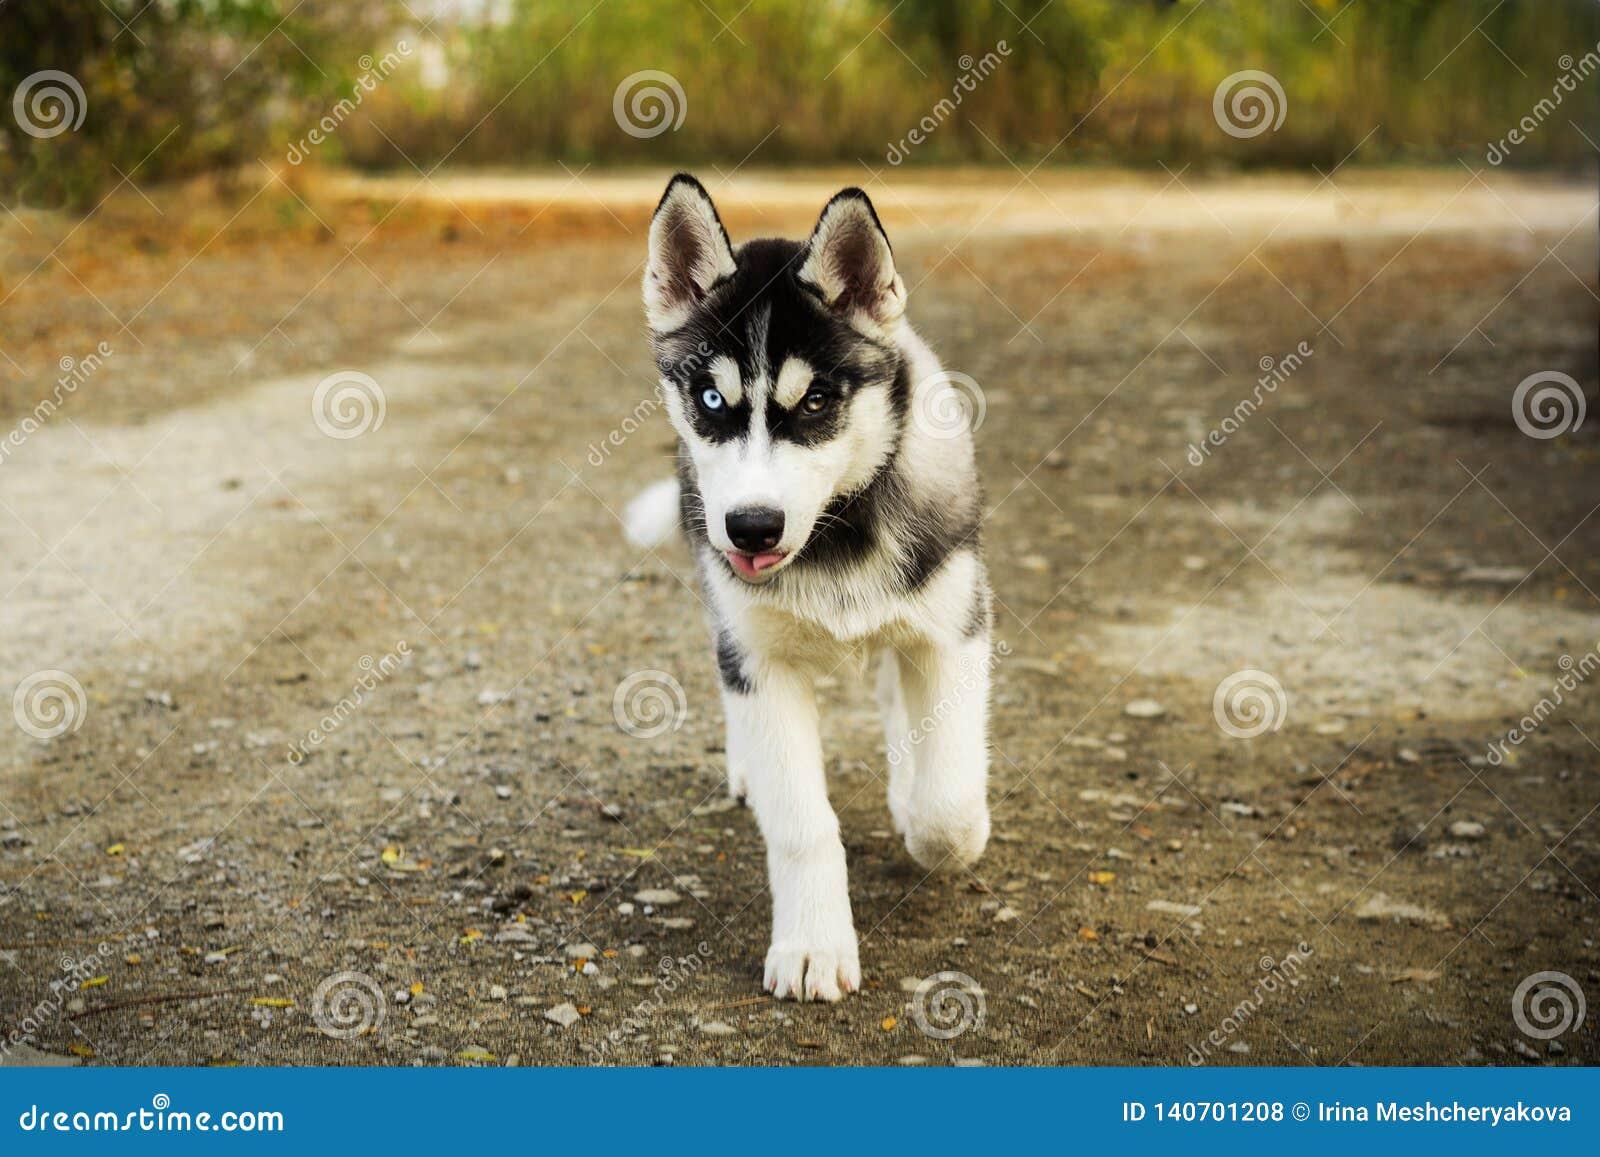 Siberian Husky Dog Running In Summer Stock Photography